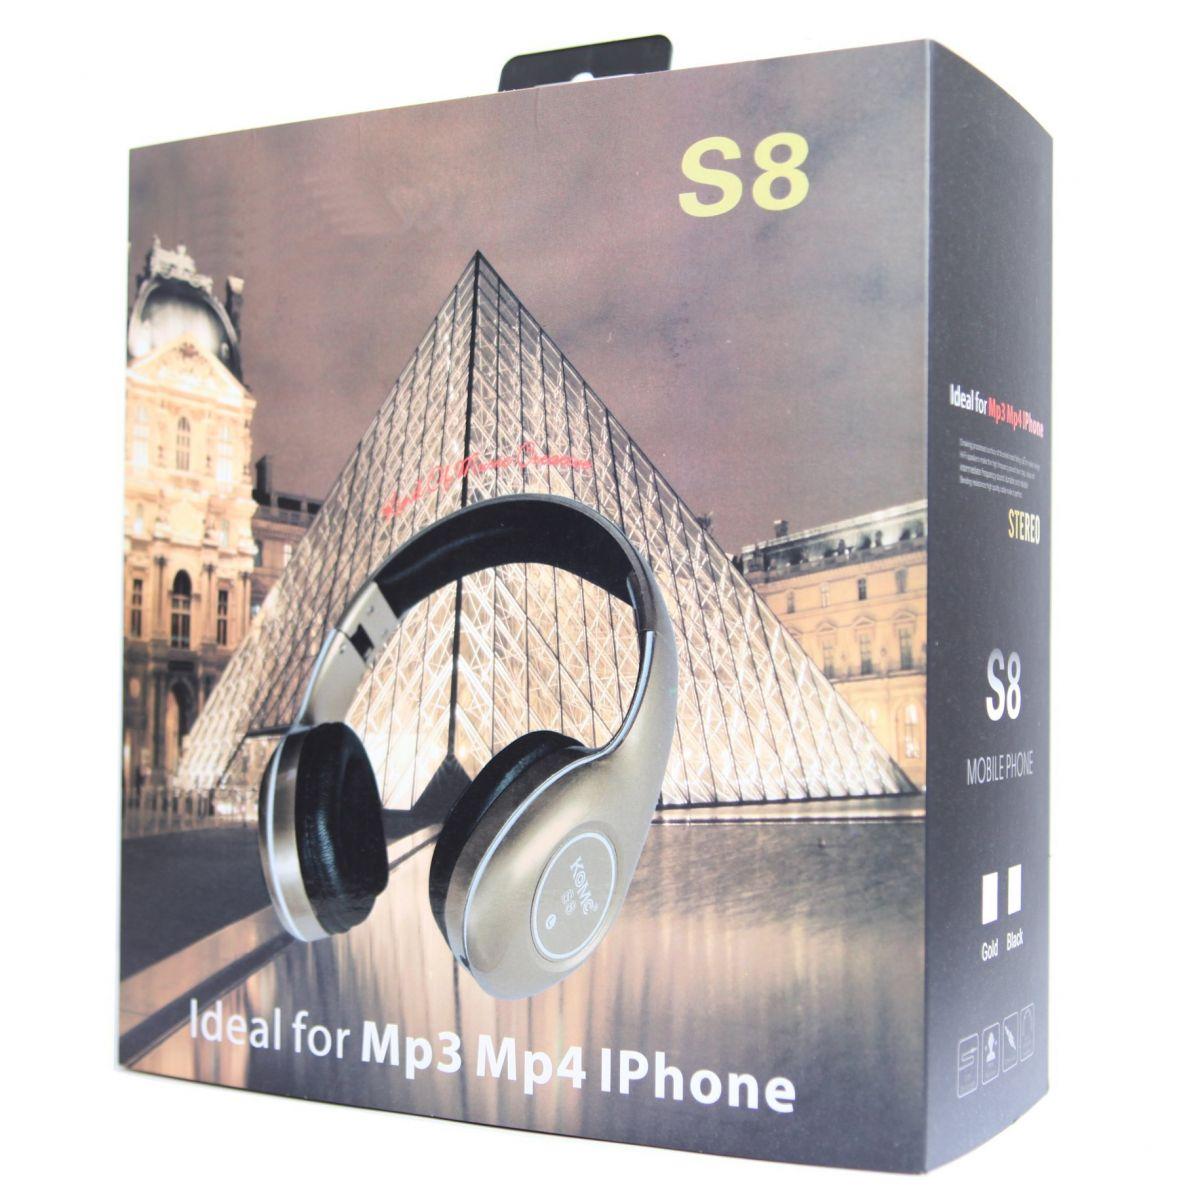 Fone Ouvido Super Bass c/ Microfone Lapela S8 Gold